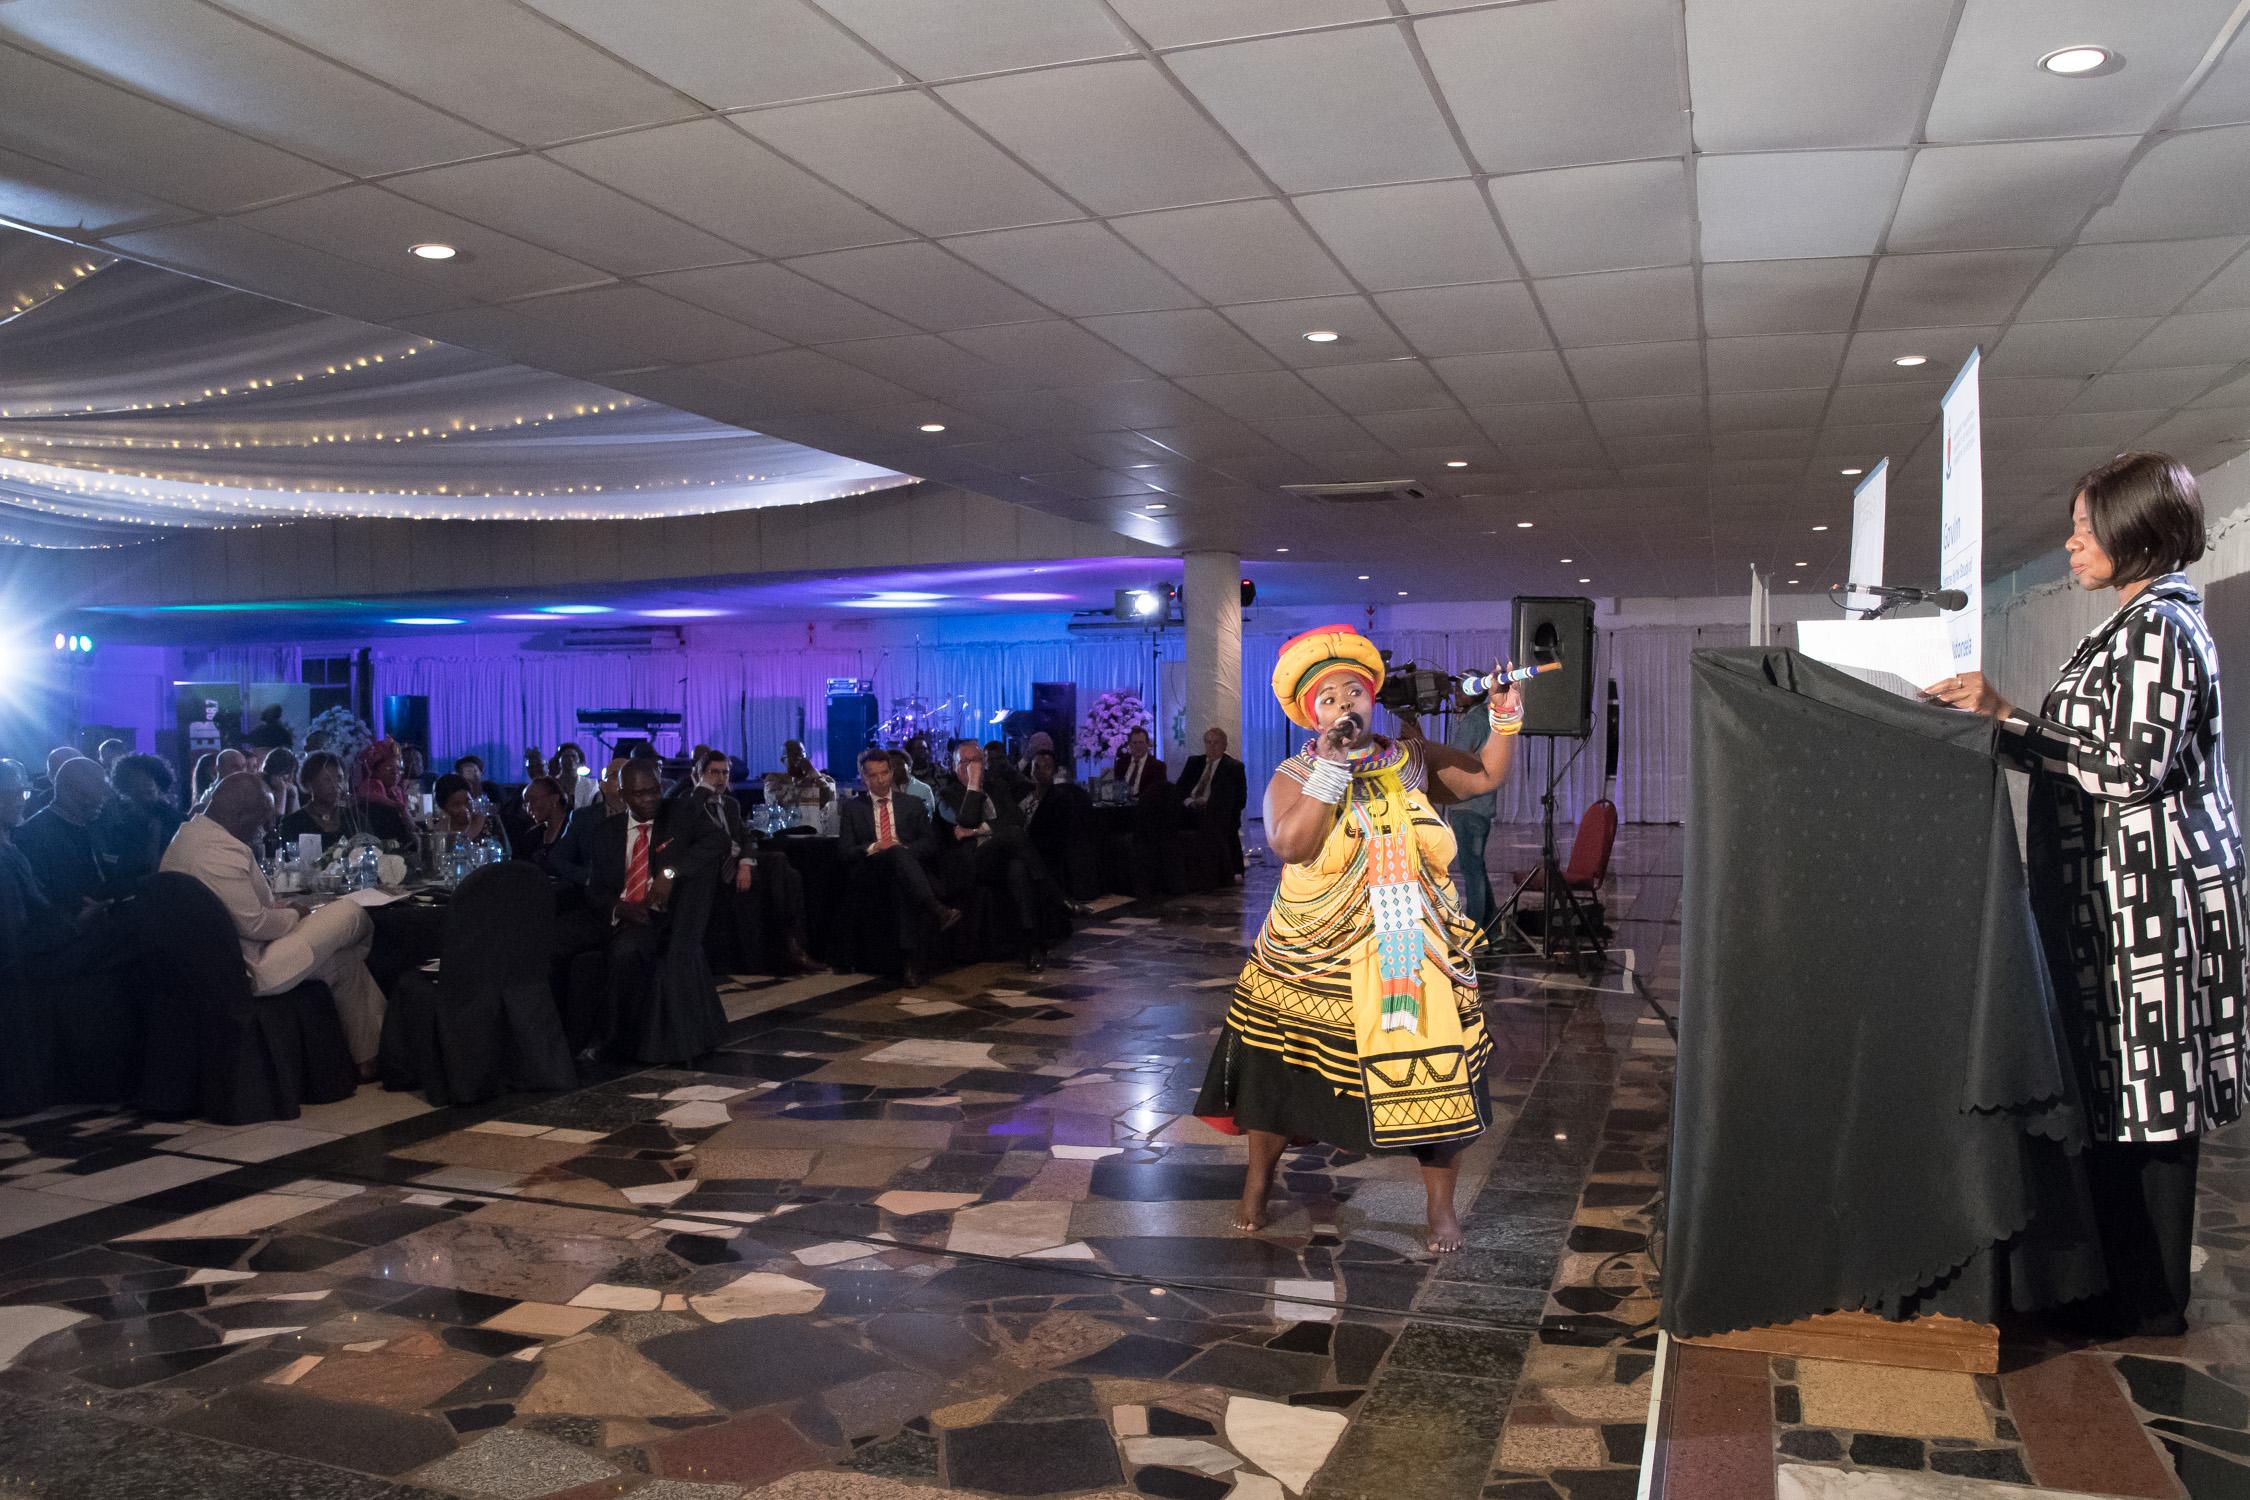 Praise poet Jessica Mbangeni